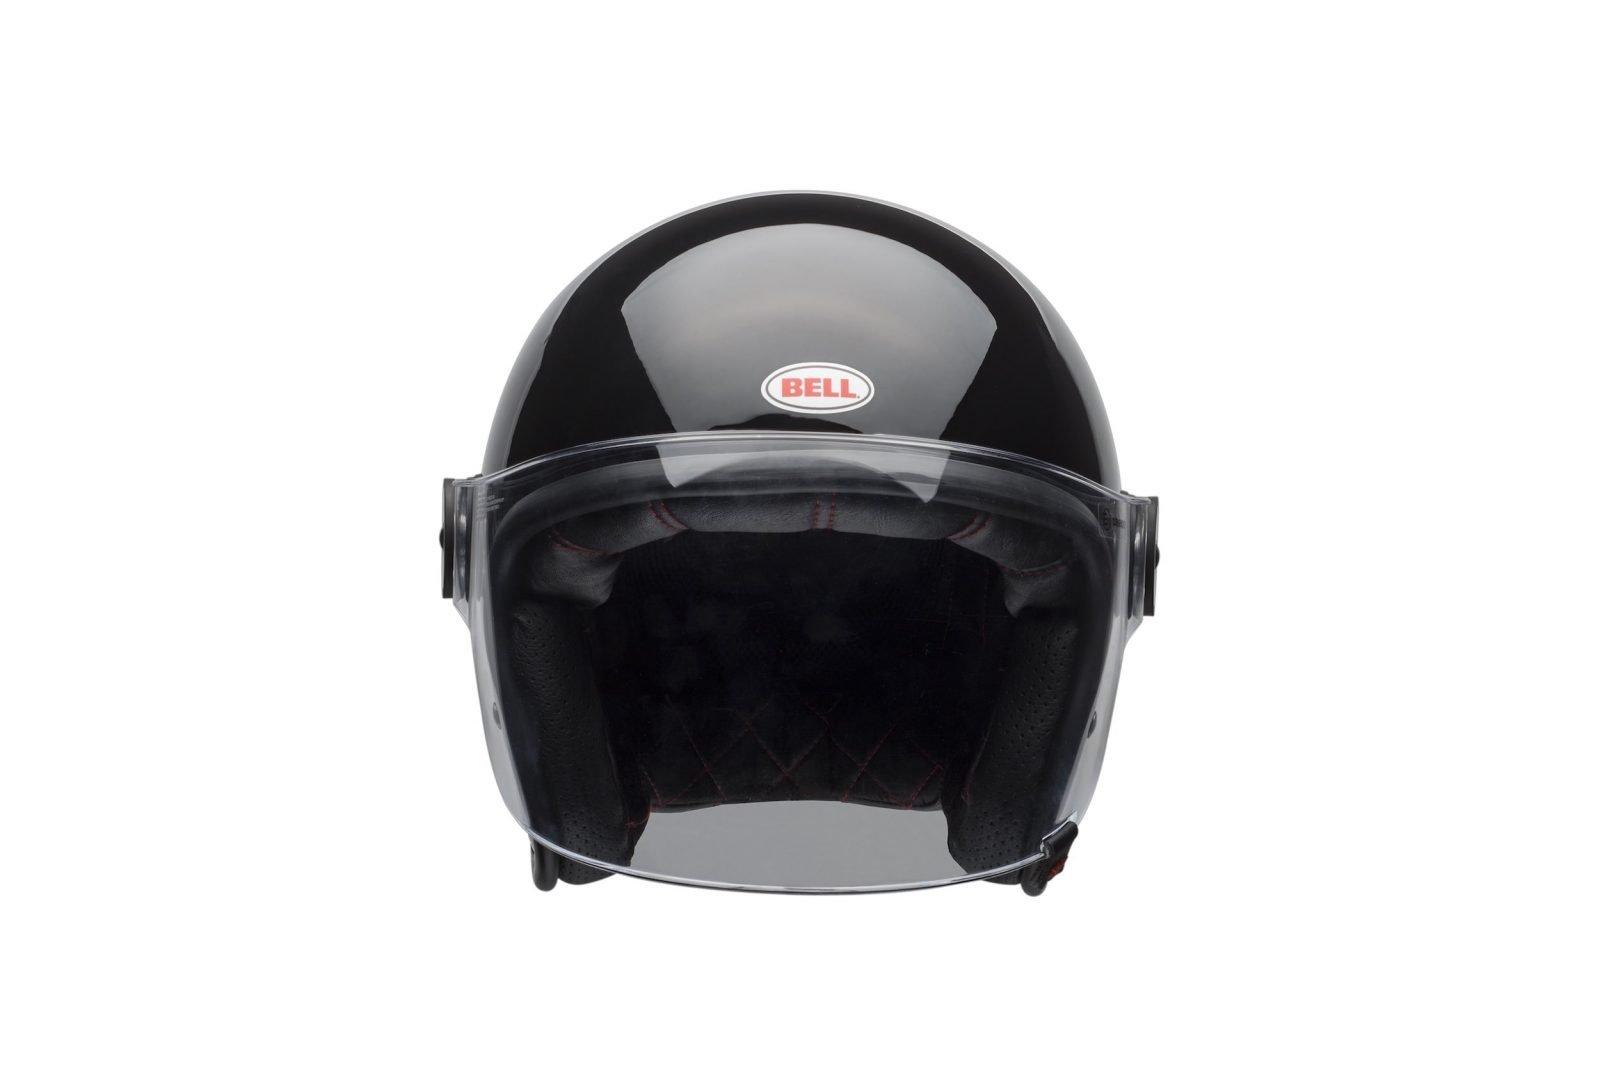 Bell Riot Helmet 2 1600x1068 - Bell Riot Helmet